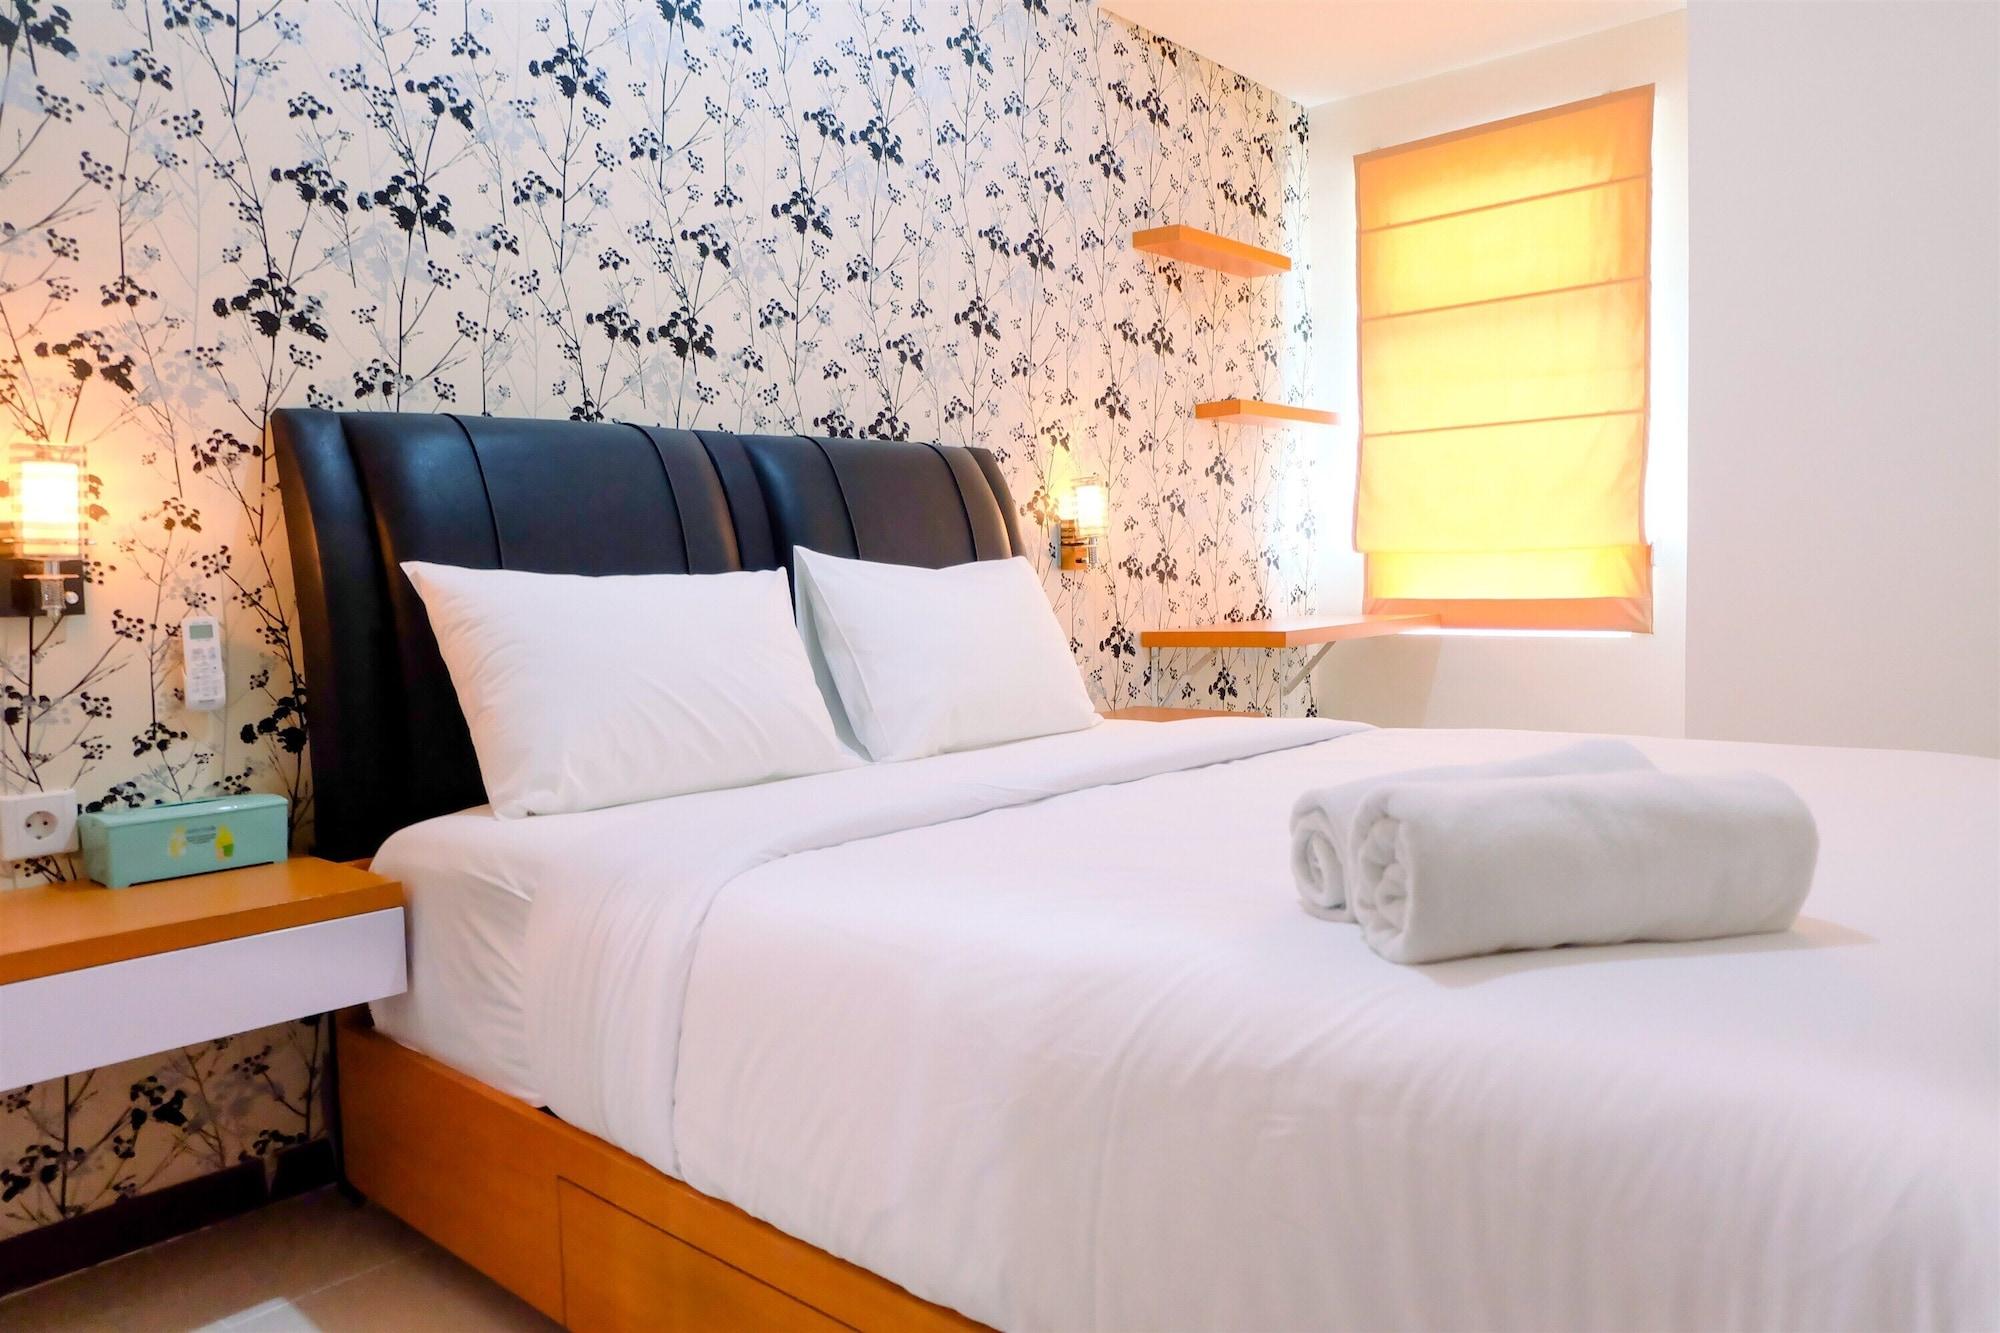 1BR Sea View Condominium at Green Bay Pluit Apartment, North Jakarta